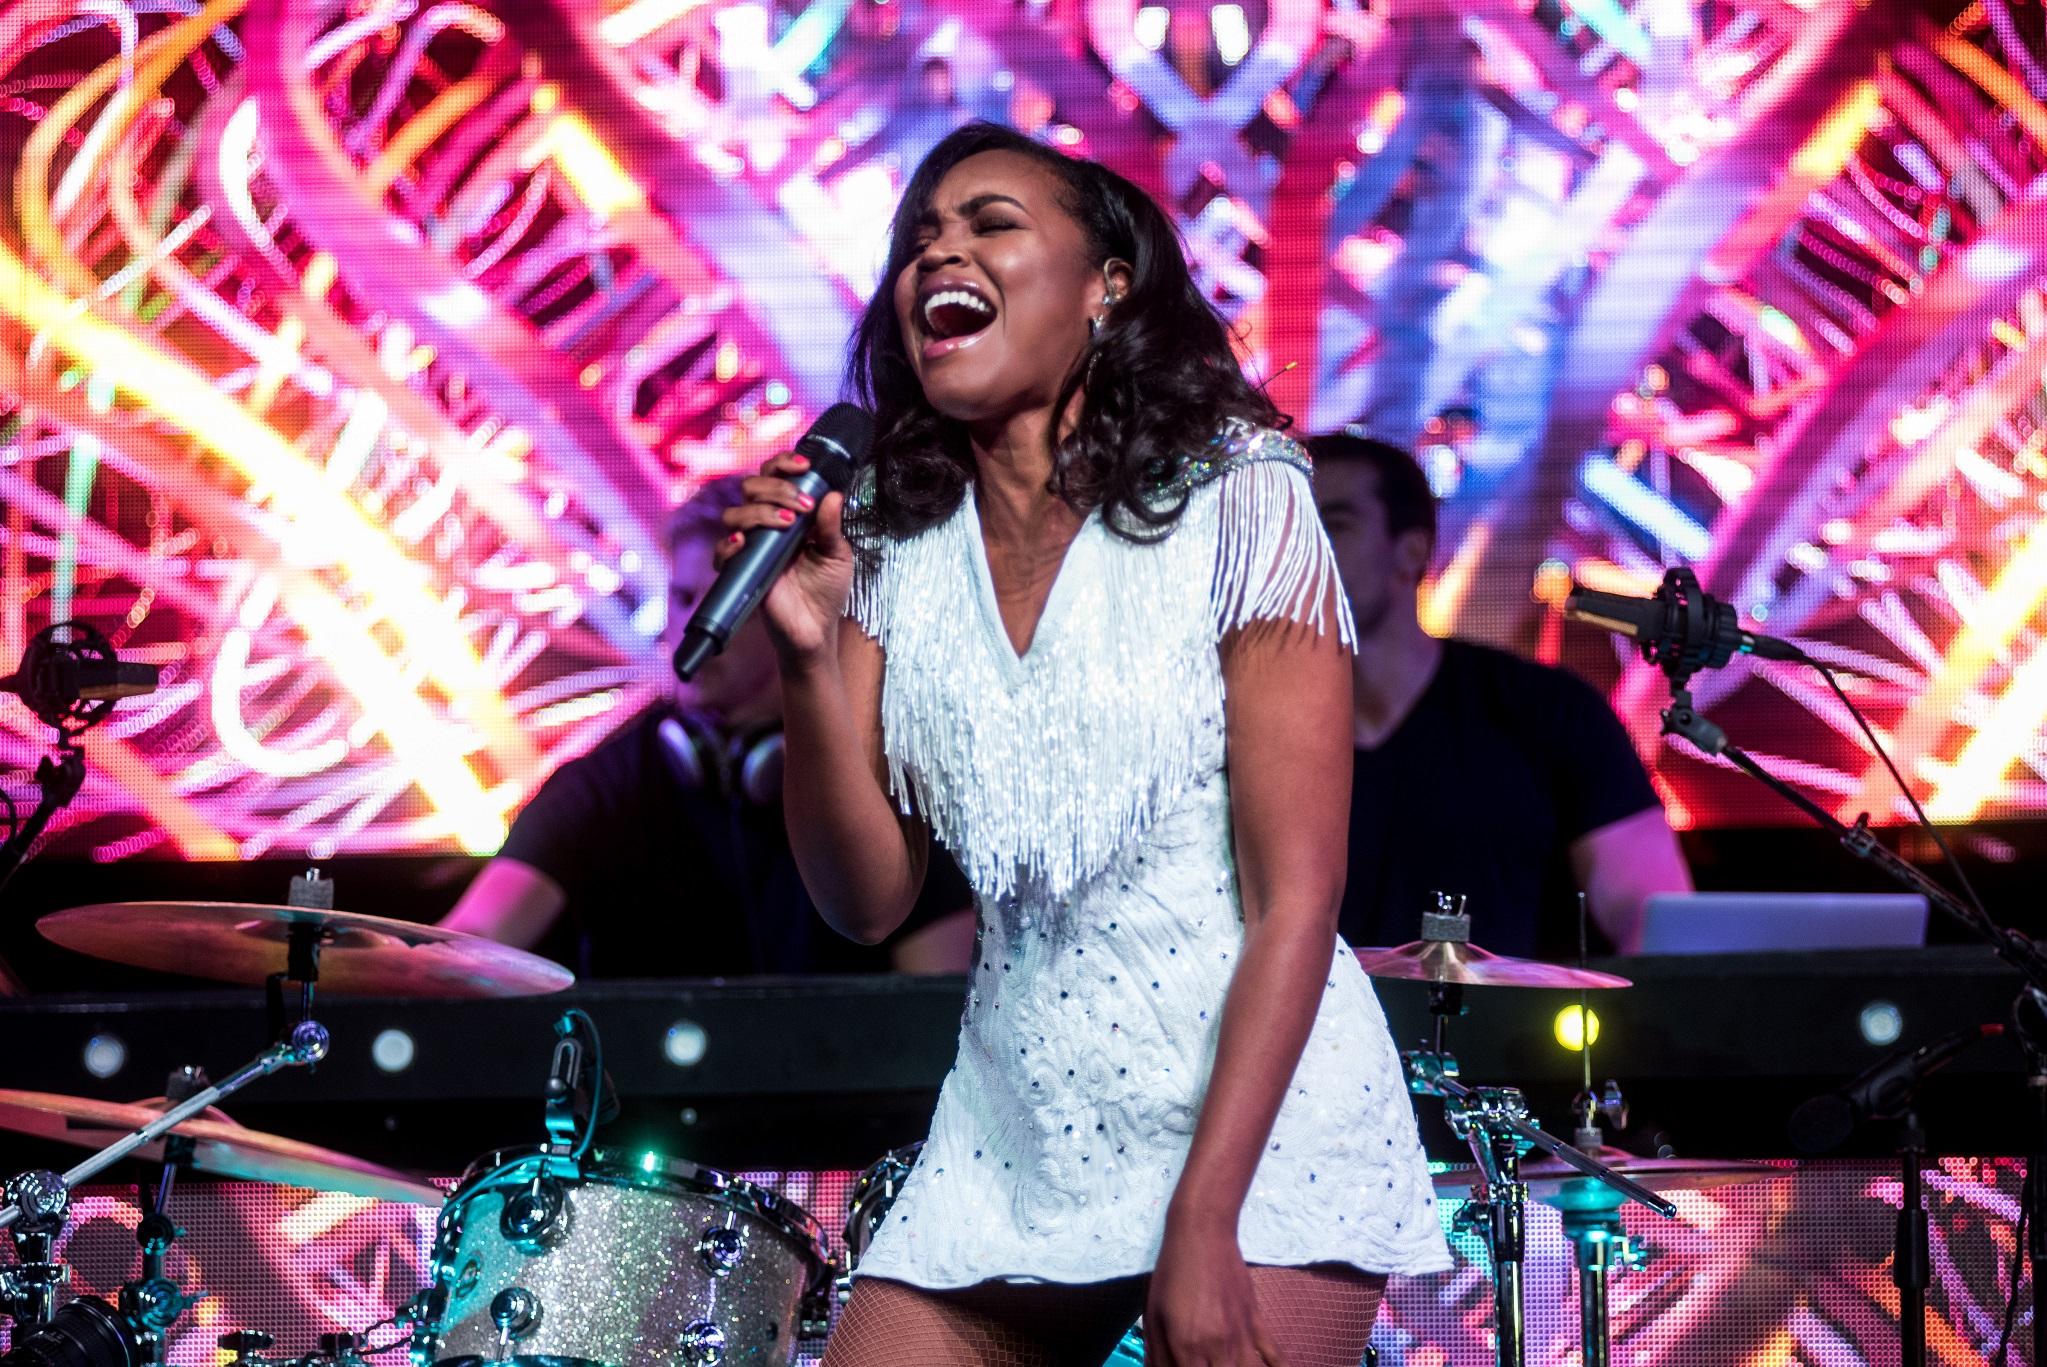 Glorious-Pop Singer-Livetronica Drummer-Producer-Songwriter-Marquee-Nightclub-Video-New York-NY-10lr.jpg